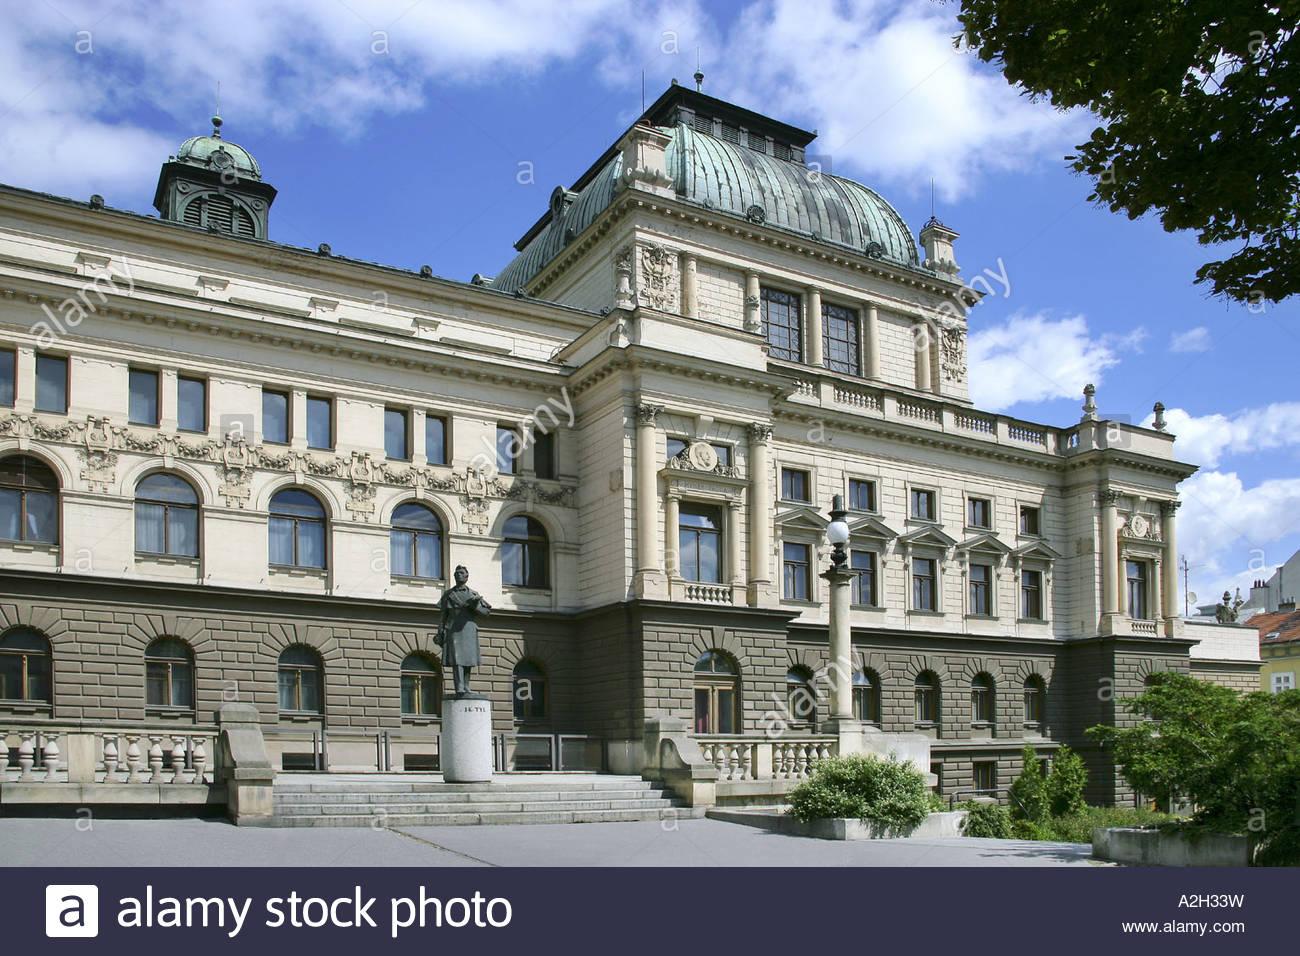 Smetana Gardens Theatre of J K Tyl 1899 1902 A Balsanek Neo Renaissance Plzen CR - Stock Image